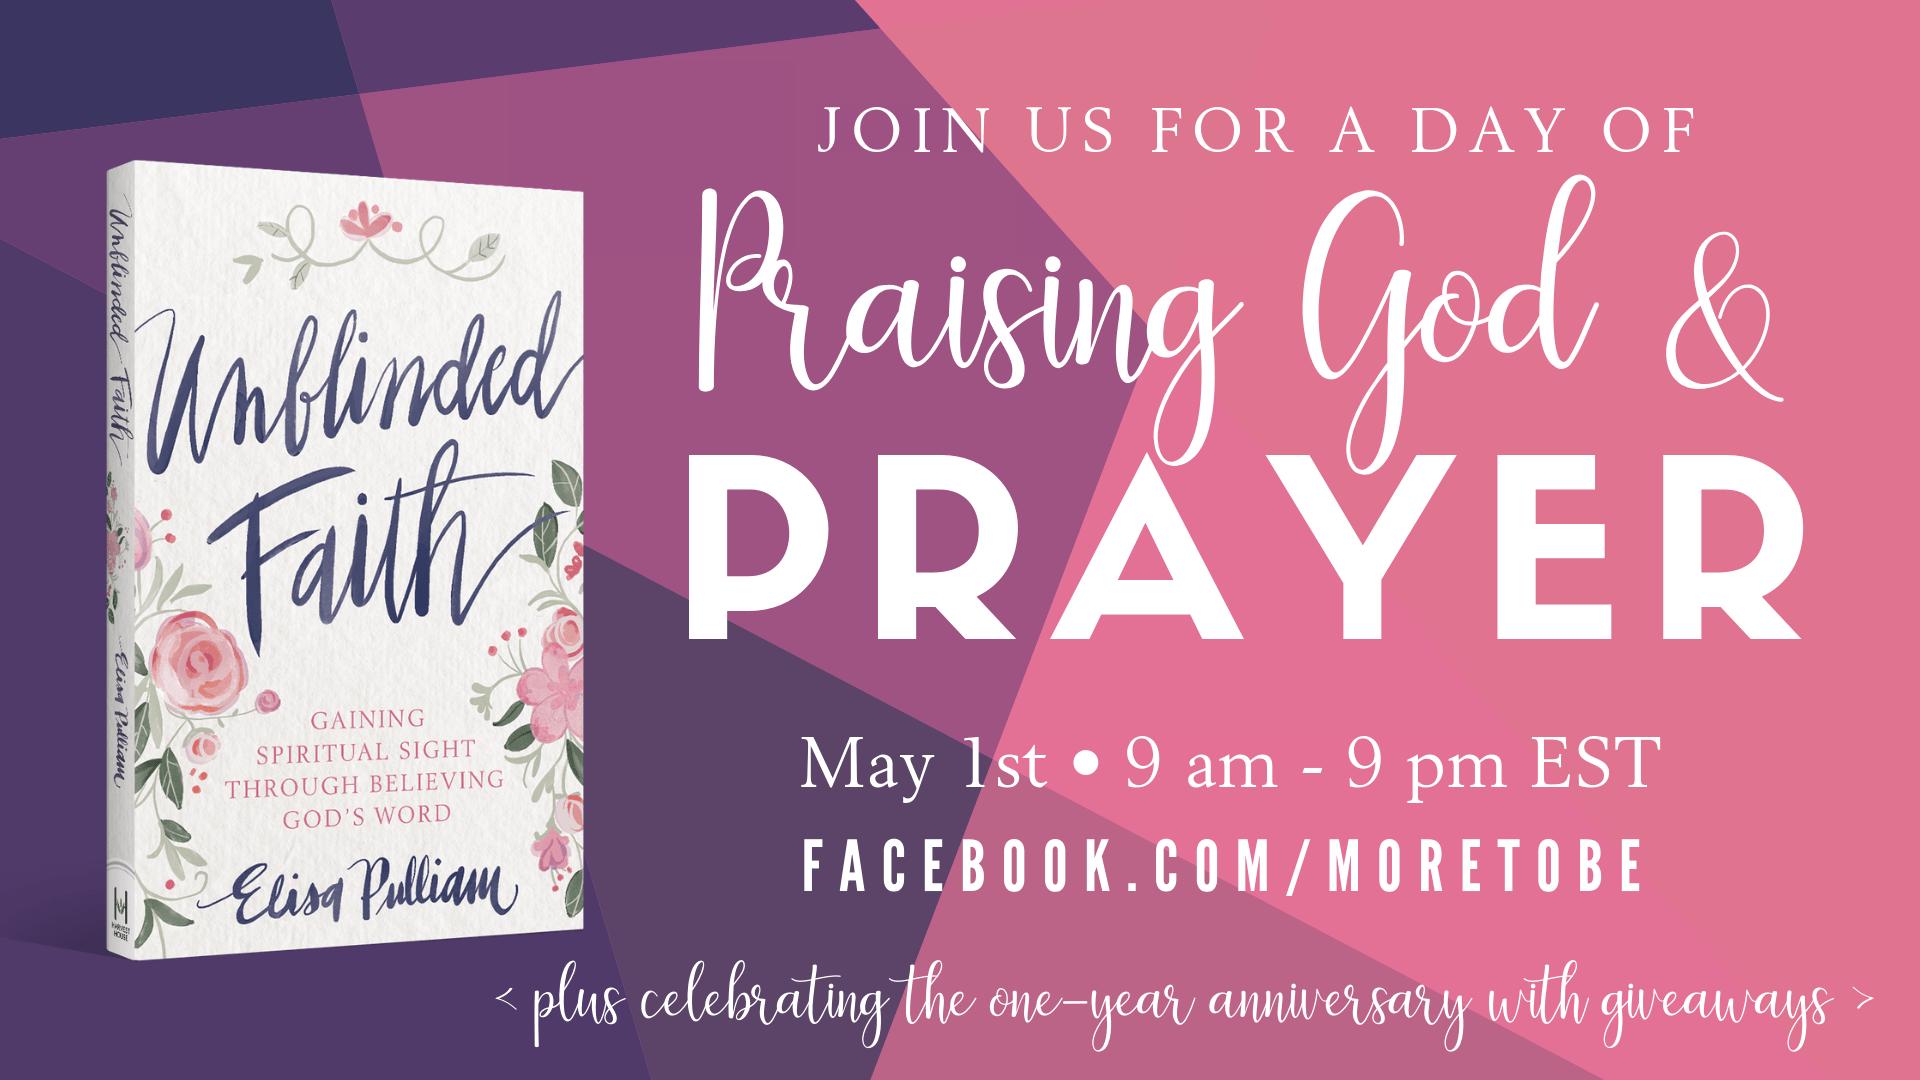 Unblinded Faith Day of Praising God and Prayer